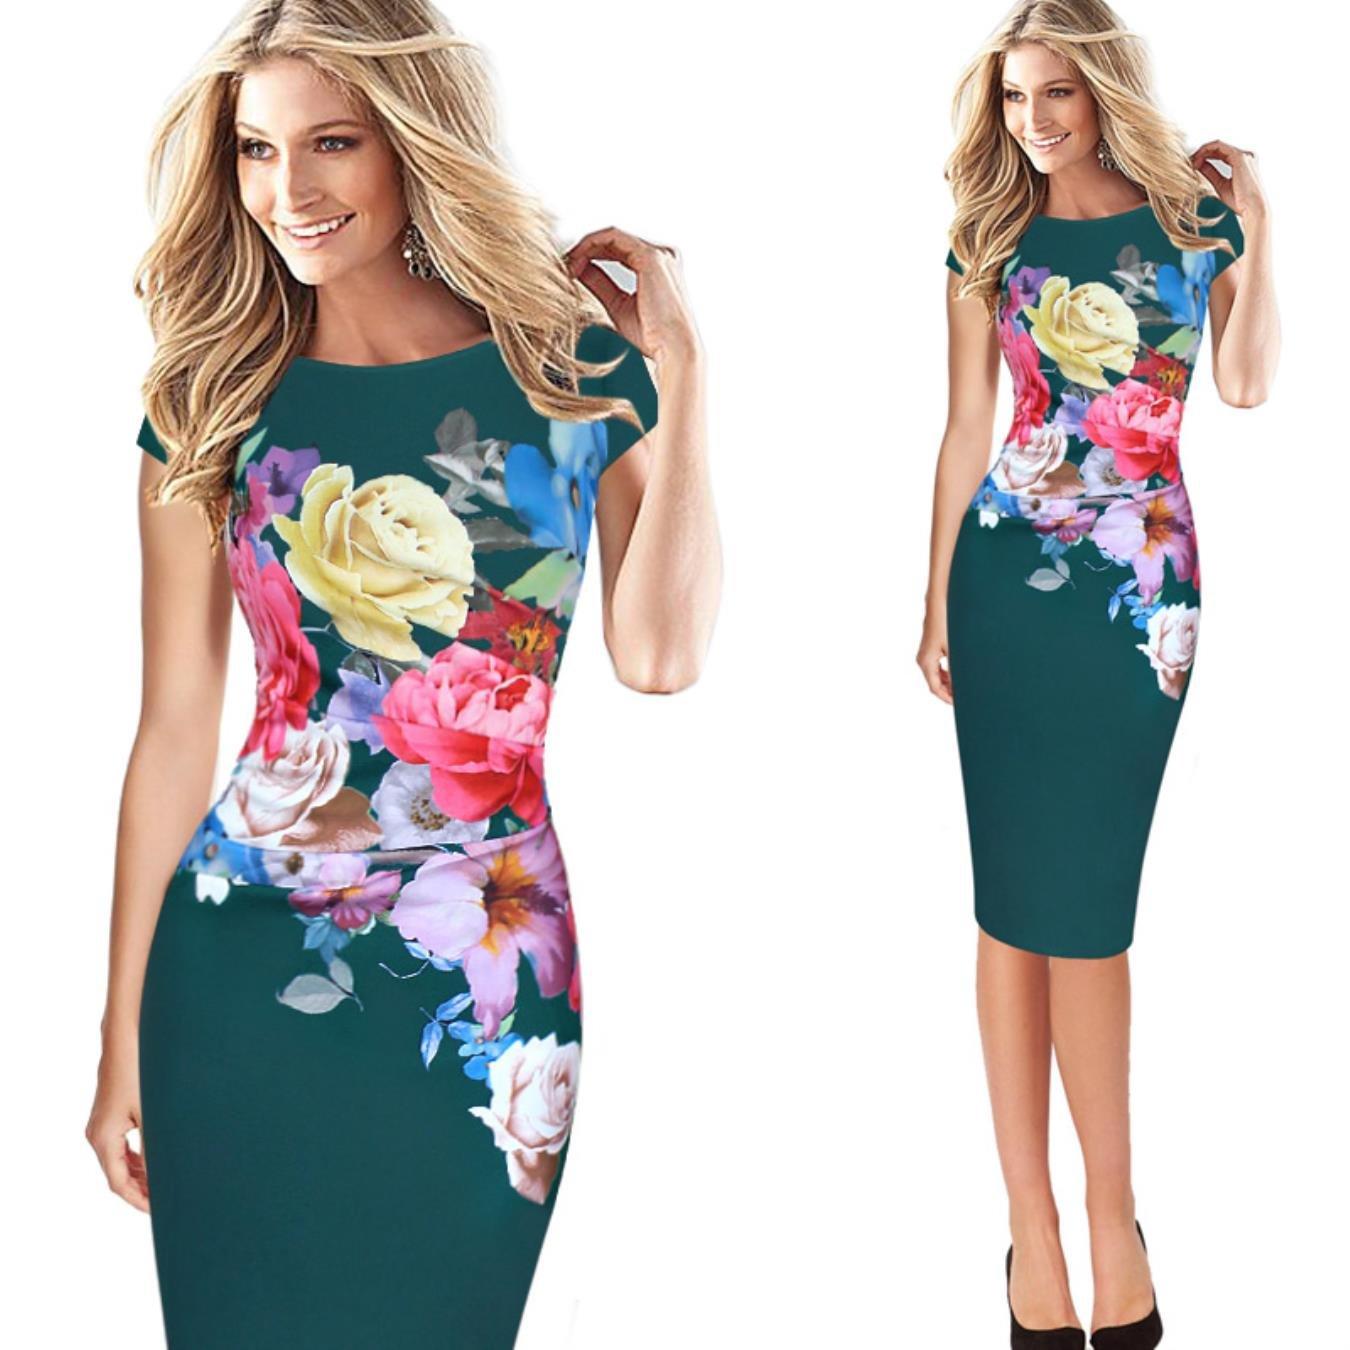 Dark Green NJSBPG Womens Elegant Flower Floral Printed Ruched Cap Sleeve Ruffle Casual Dress